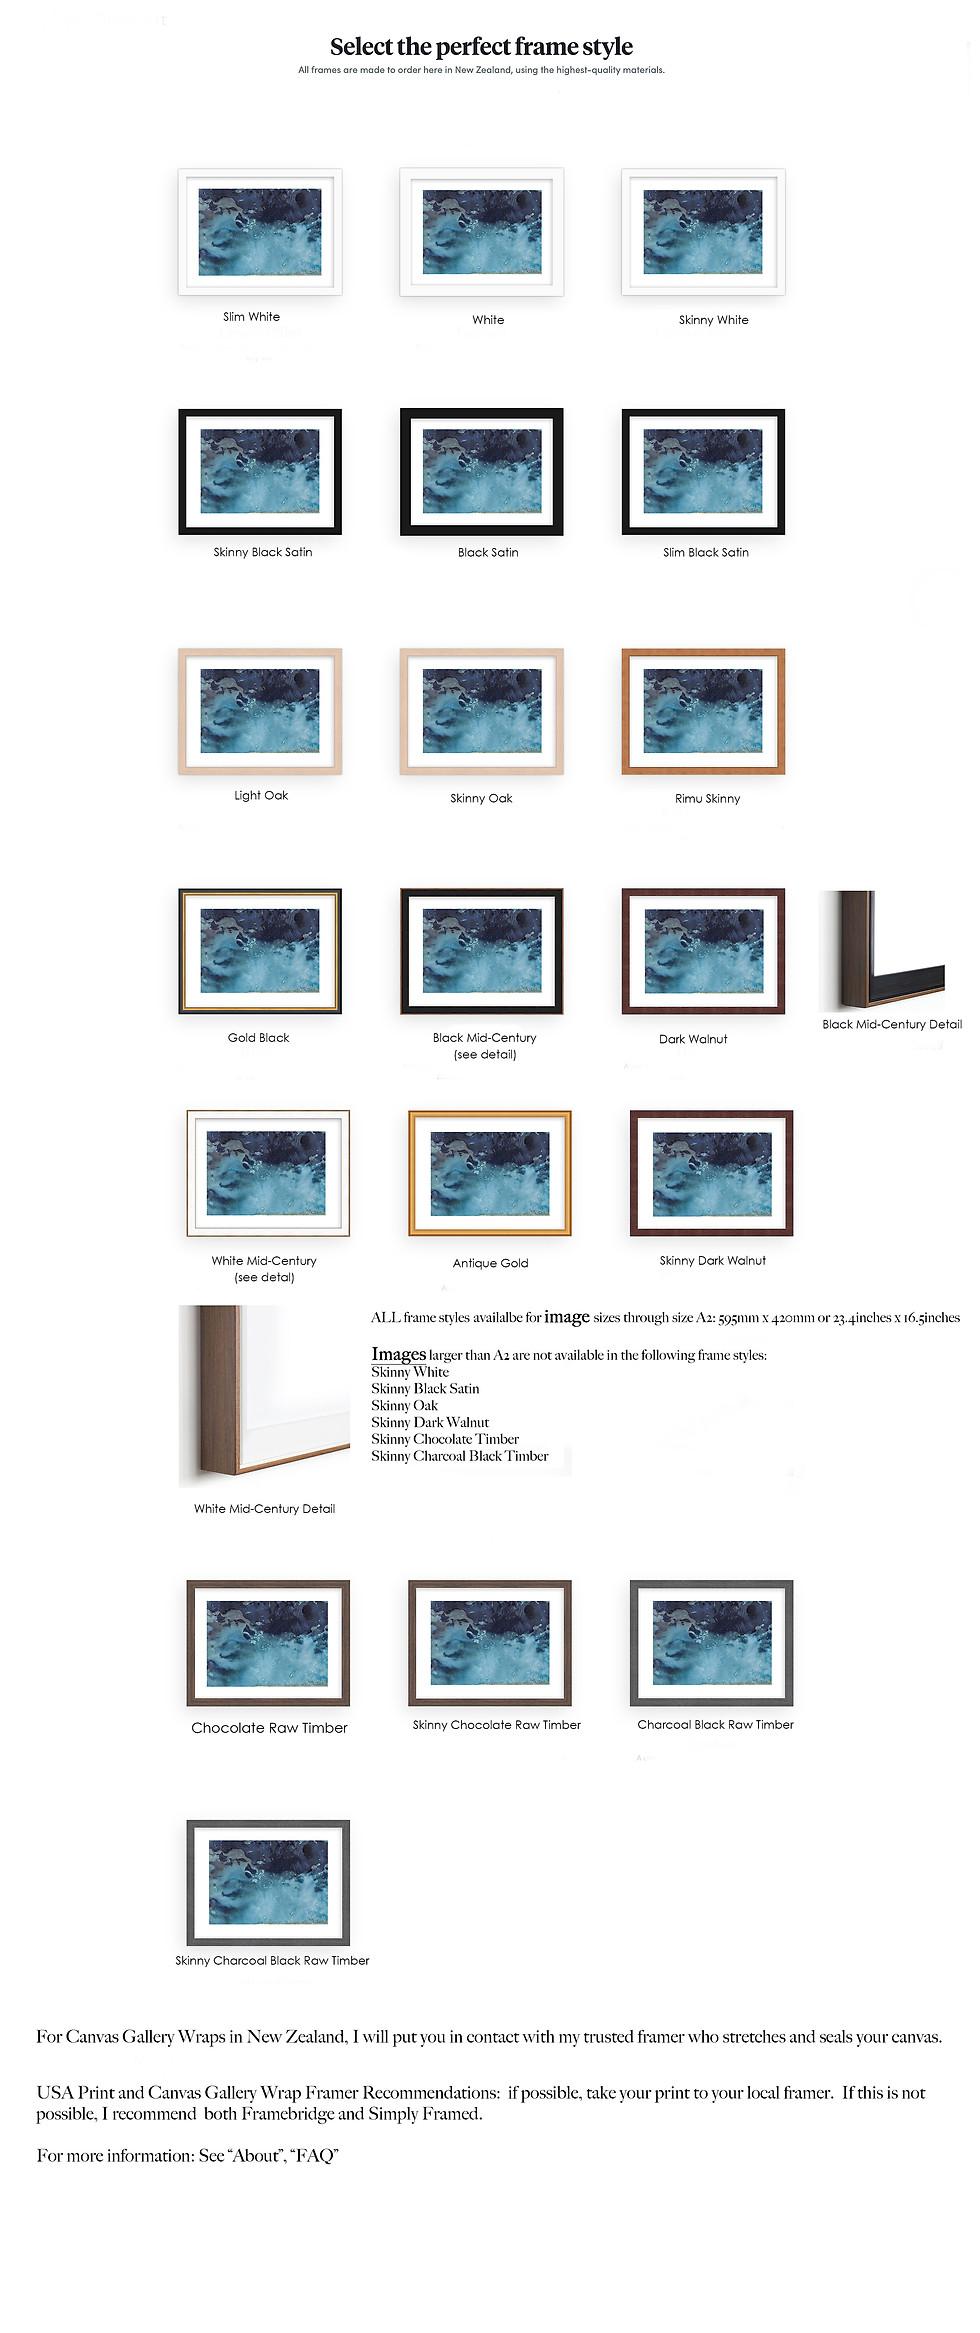 FrameStylesMaryLynnBurkeCyanotype.jpg